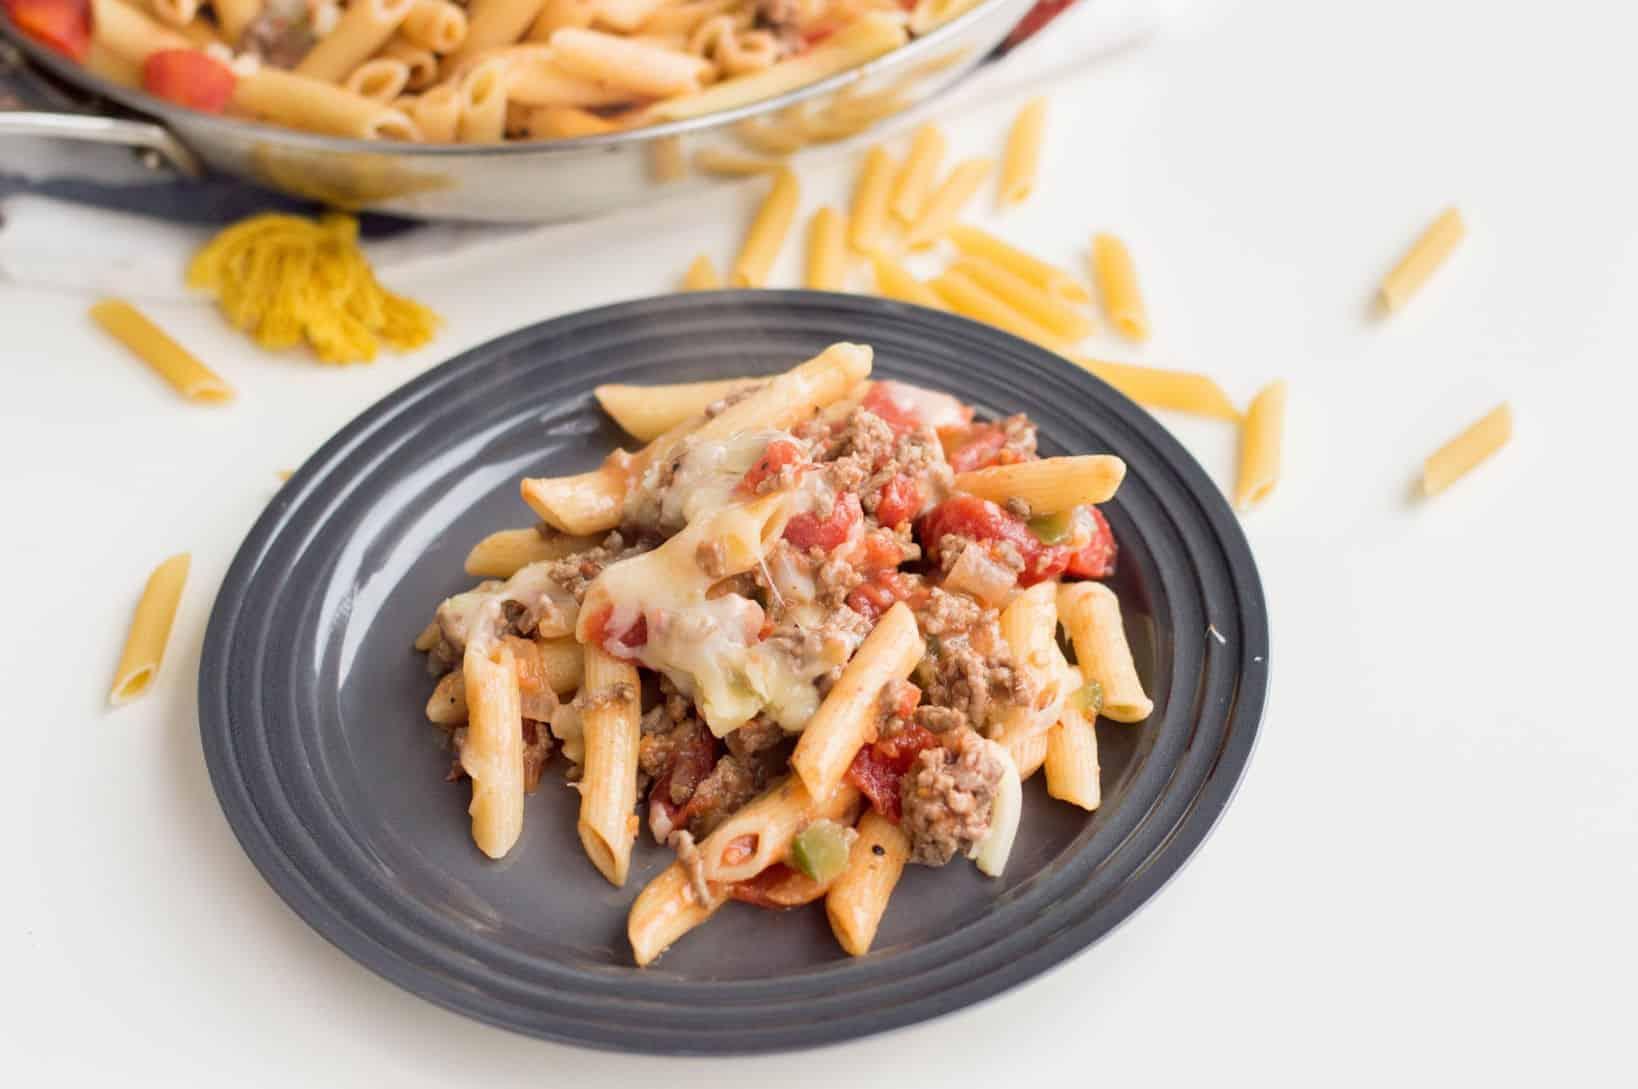 Cheeseburger pasta on a grey plate